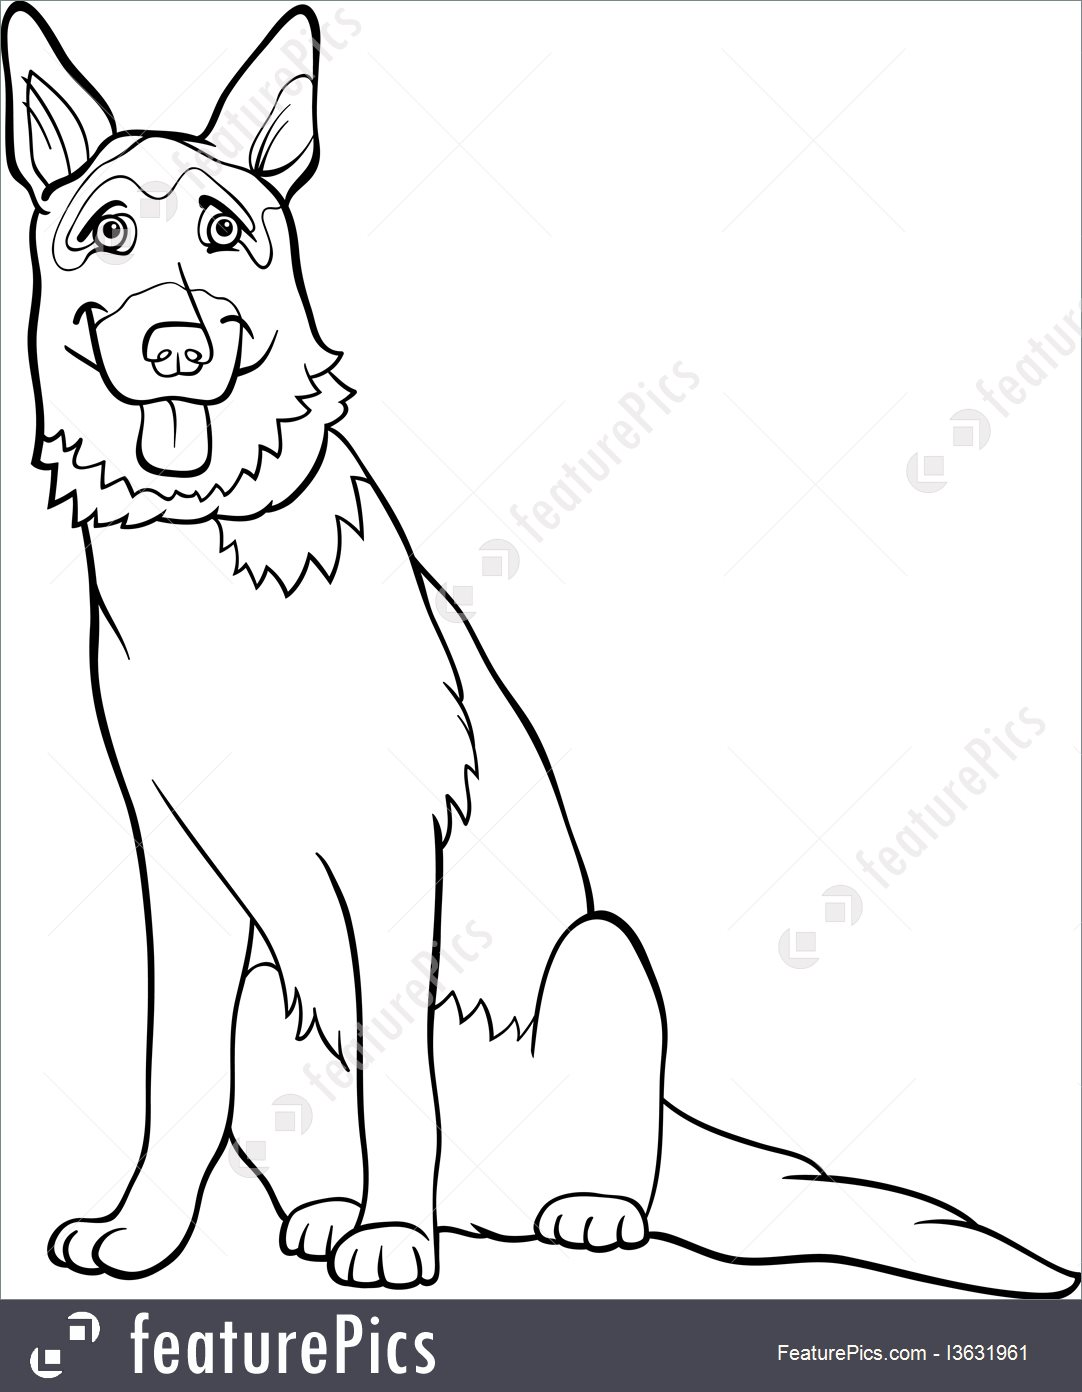 German Shepherd Dog Drawing at GetDrawings.com | Free for ...